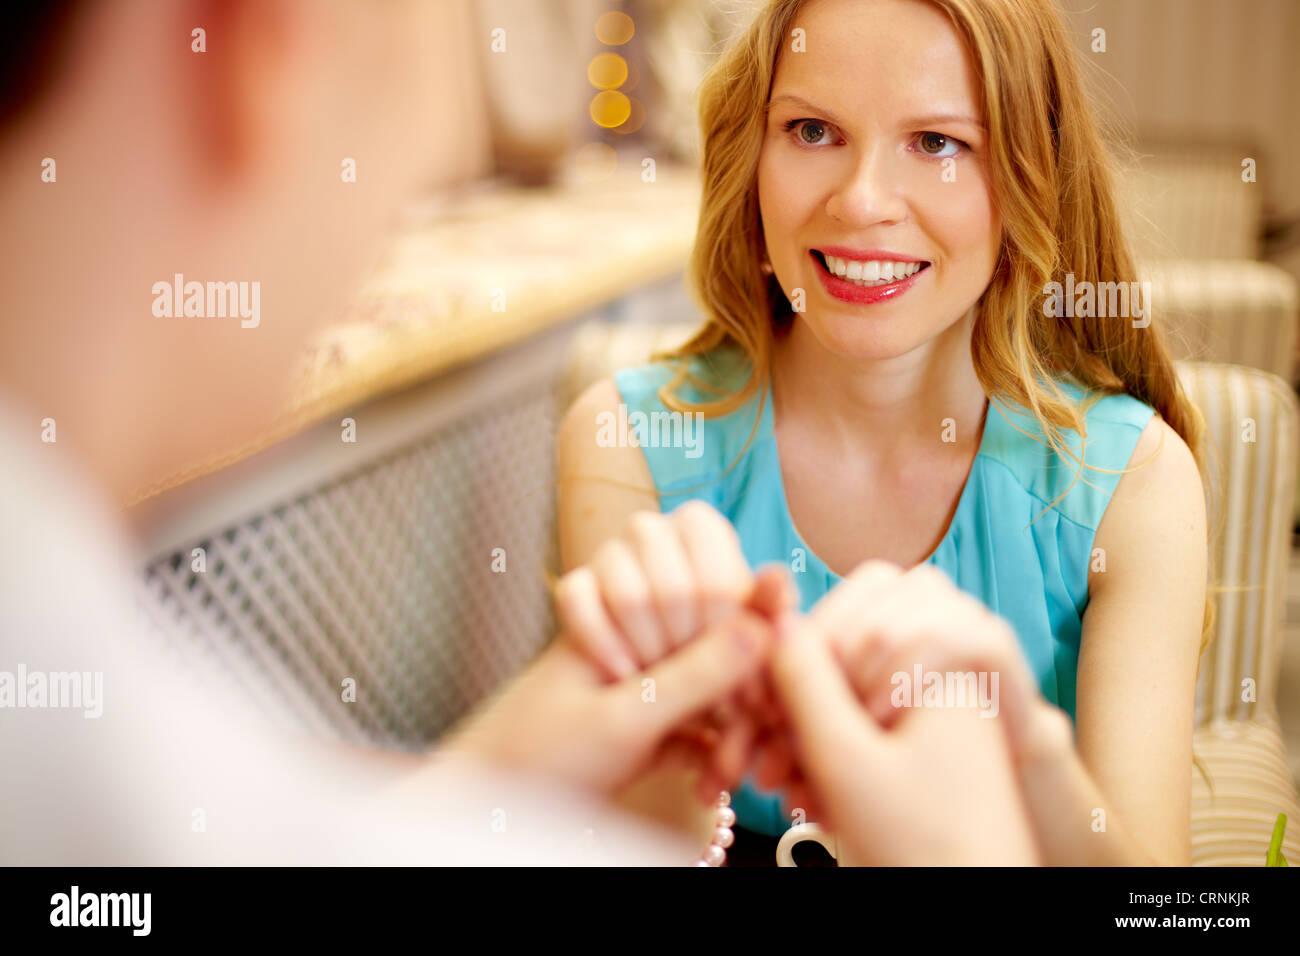 dating term nsa